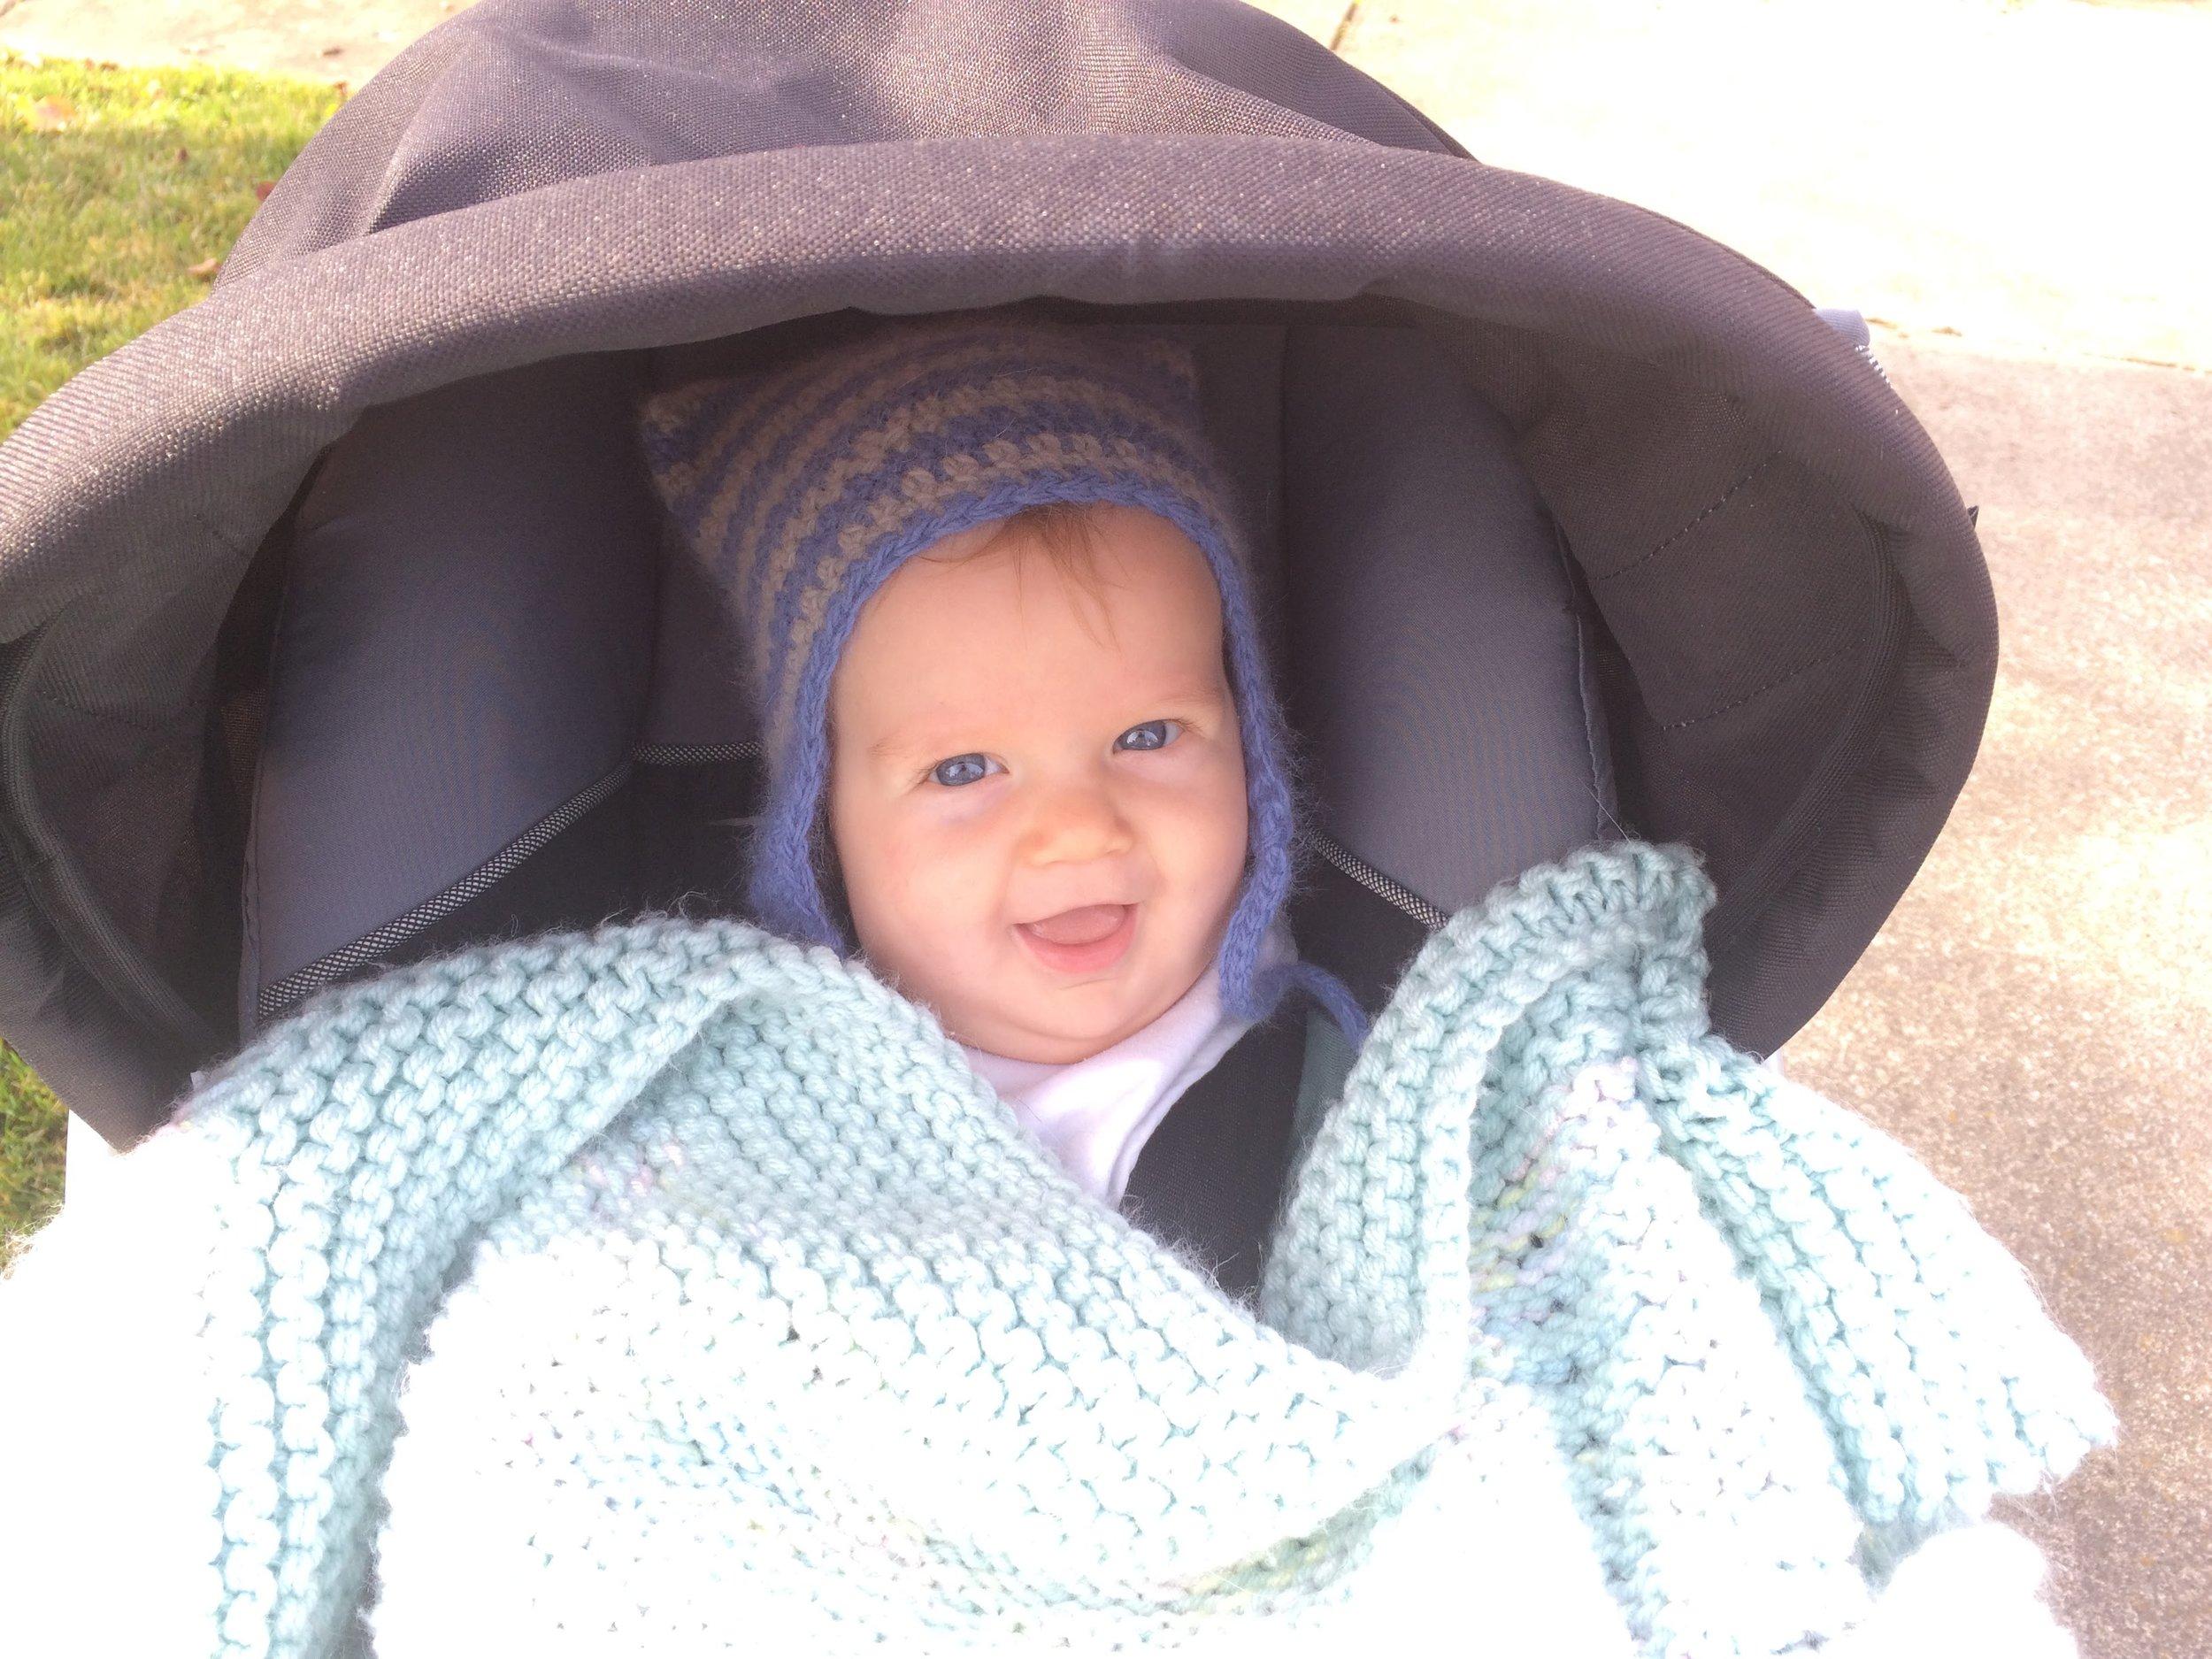 child in stroller.JPG